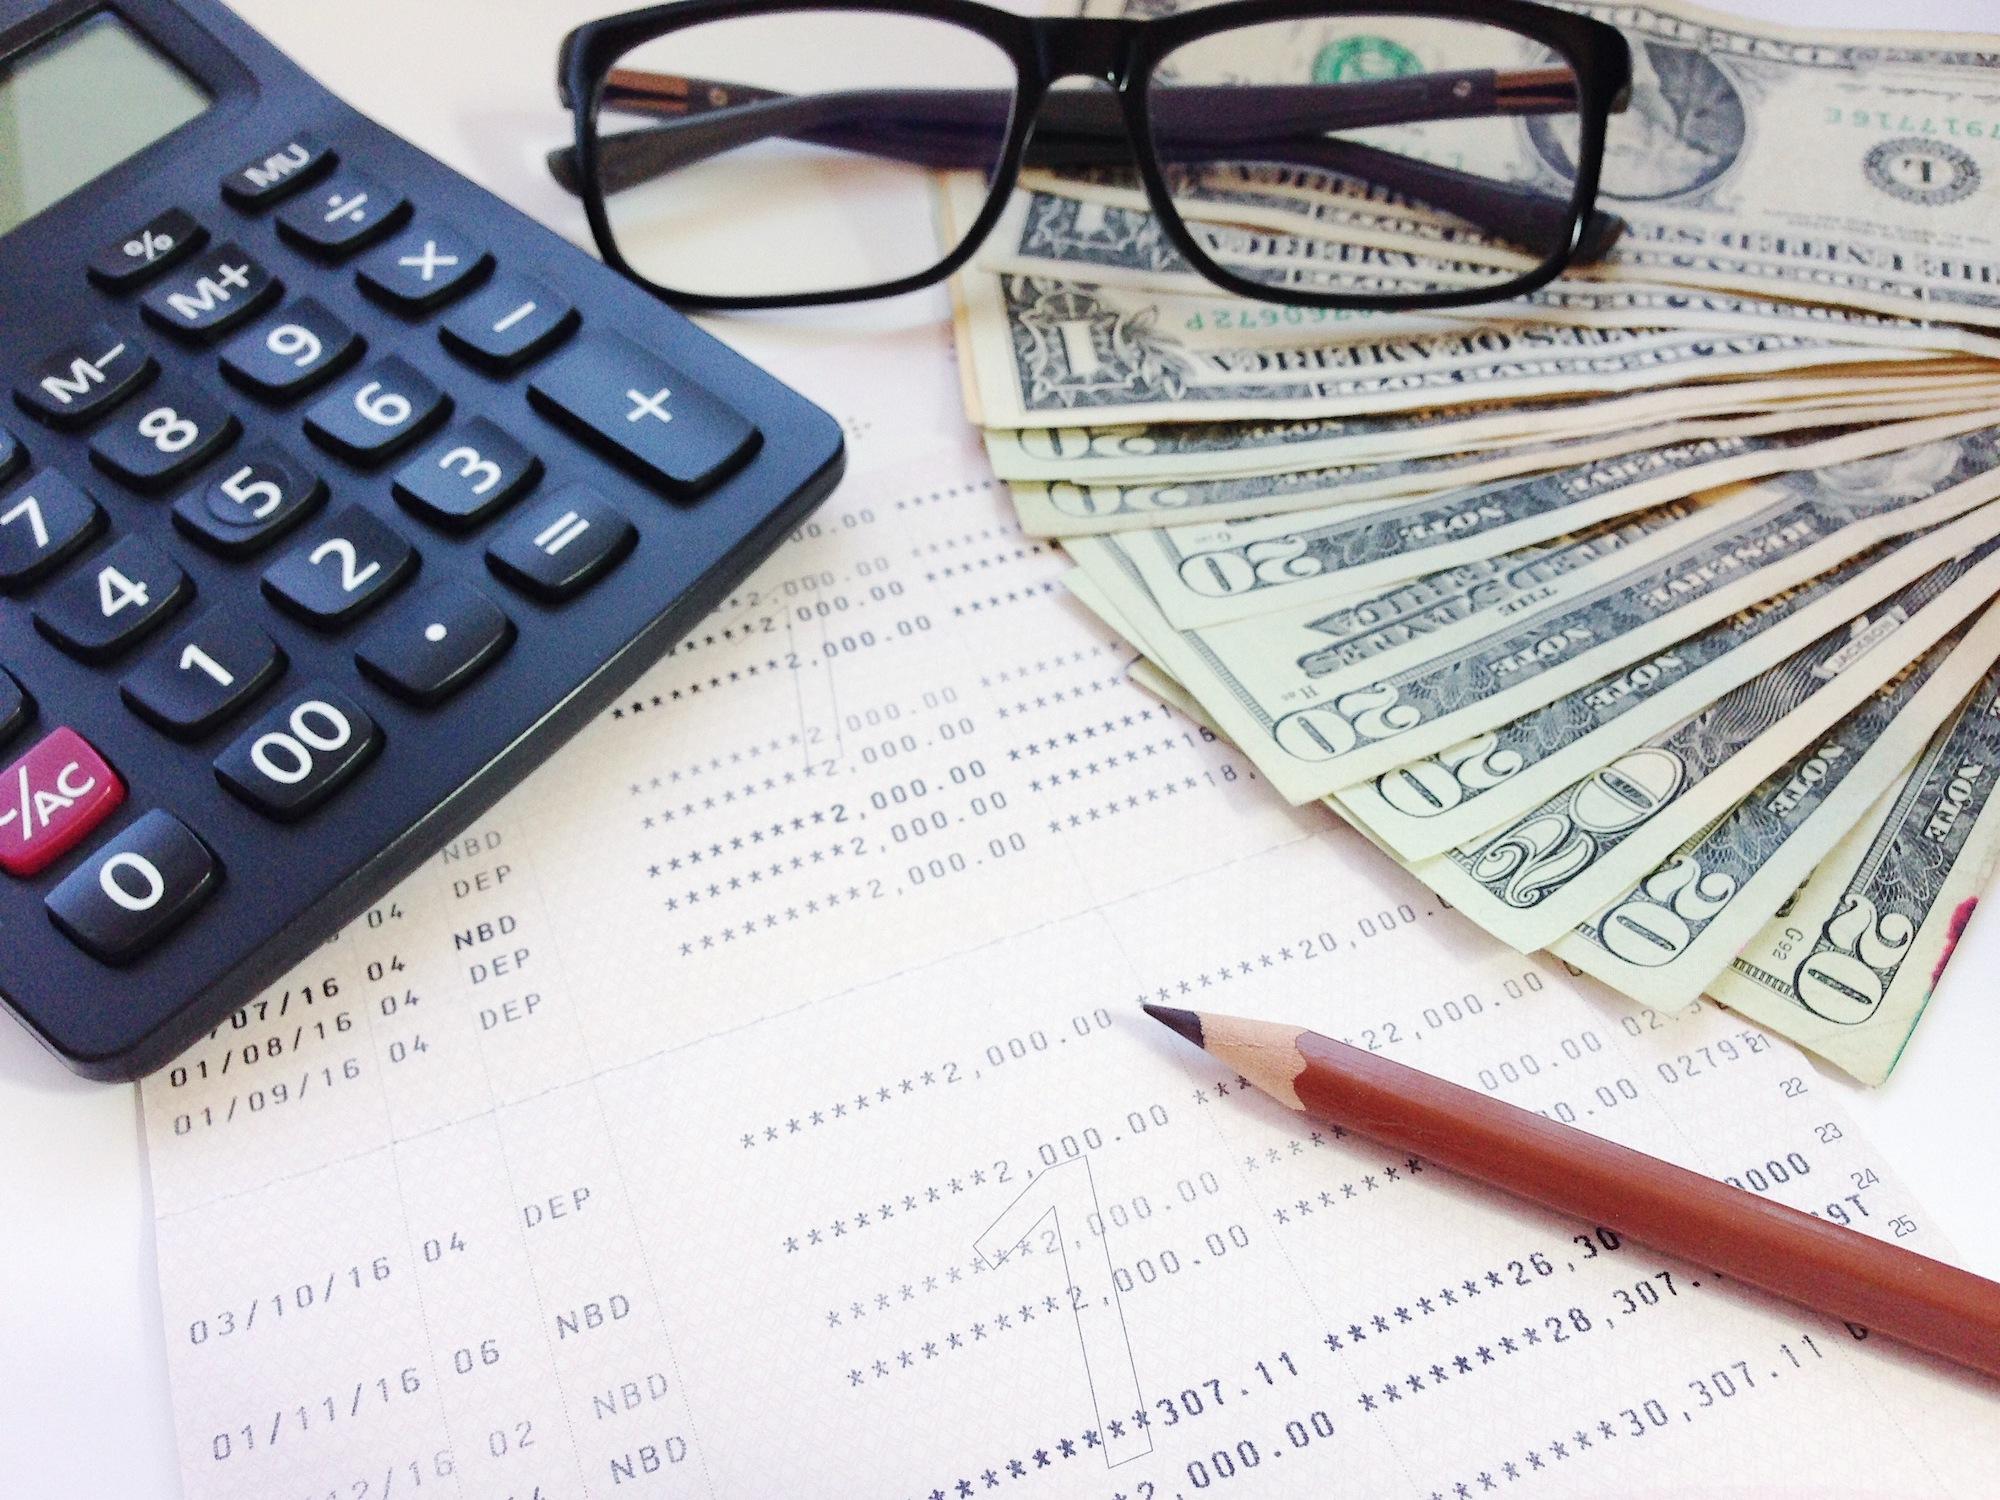 Money, glasses, and calculator